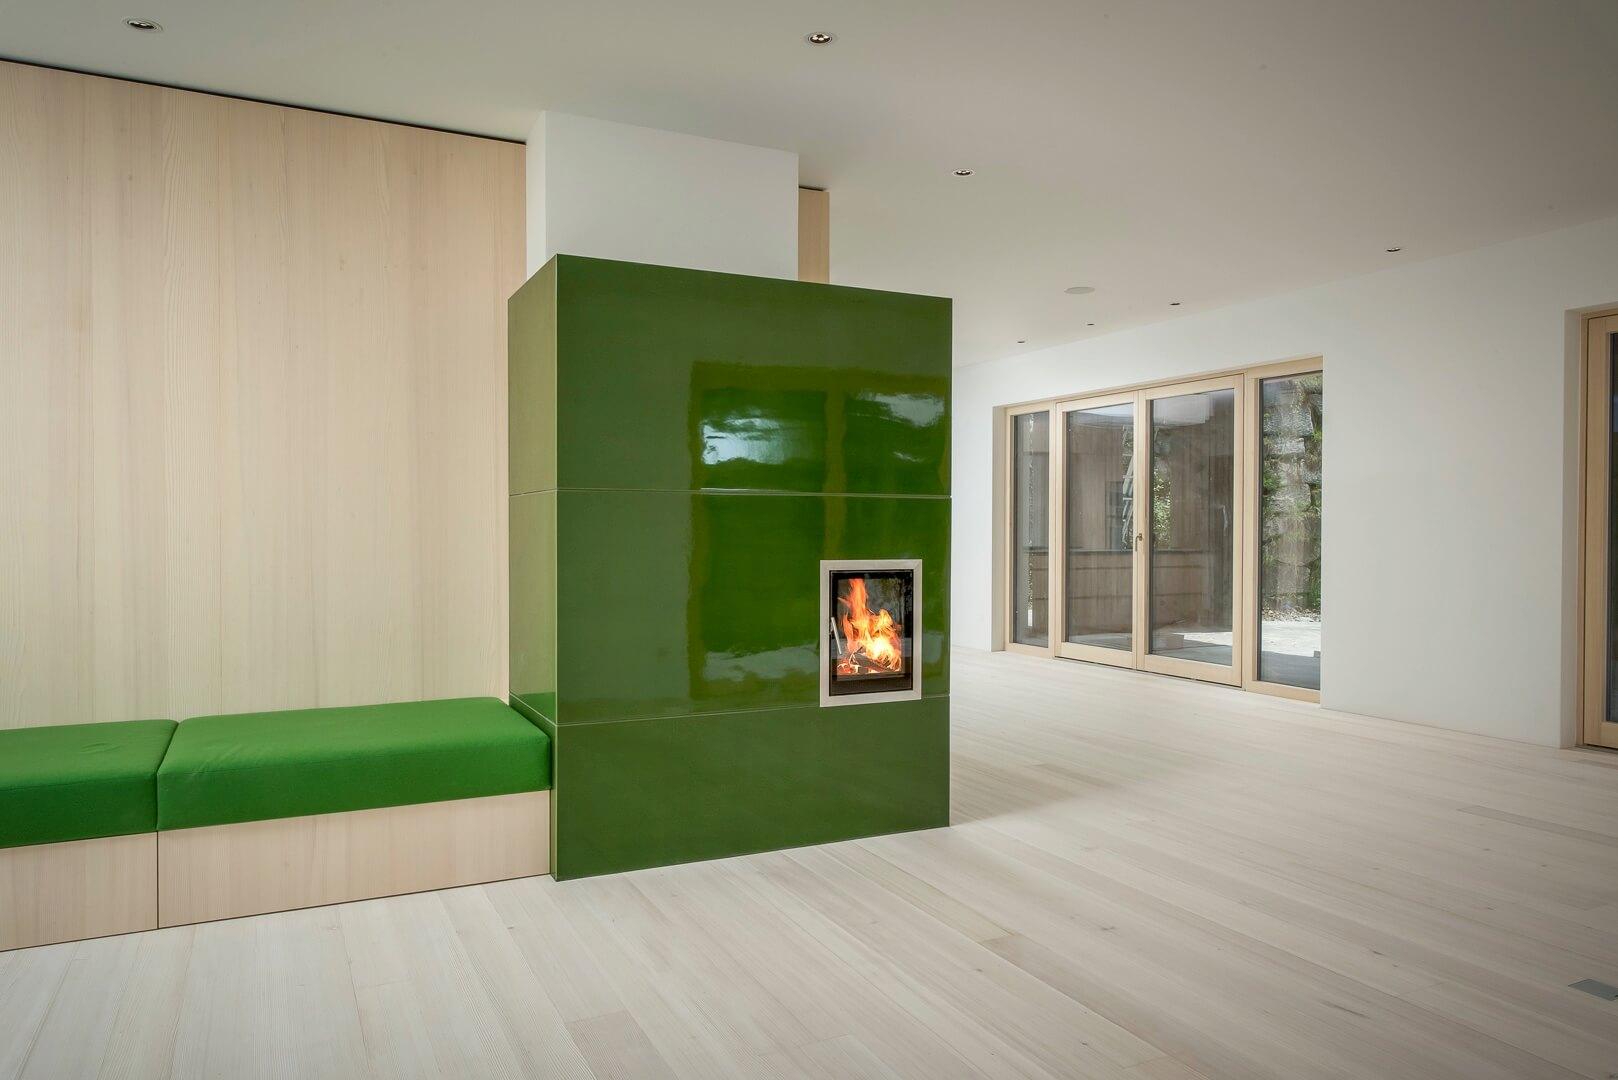 kachelofen holz amazing eckkamin kesselkamin eos schiefer. Black Bedroom Furniture Sets. Home Design Ideas